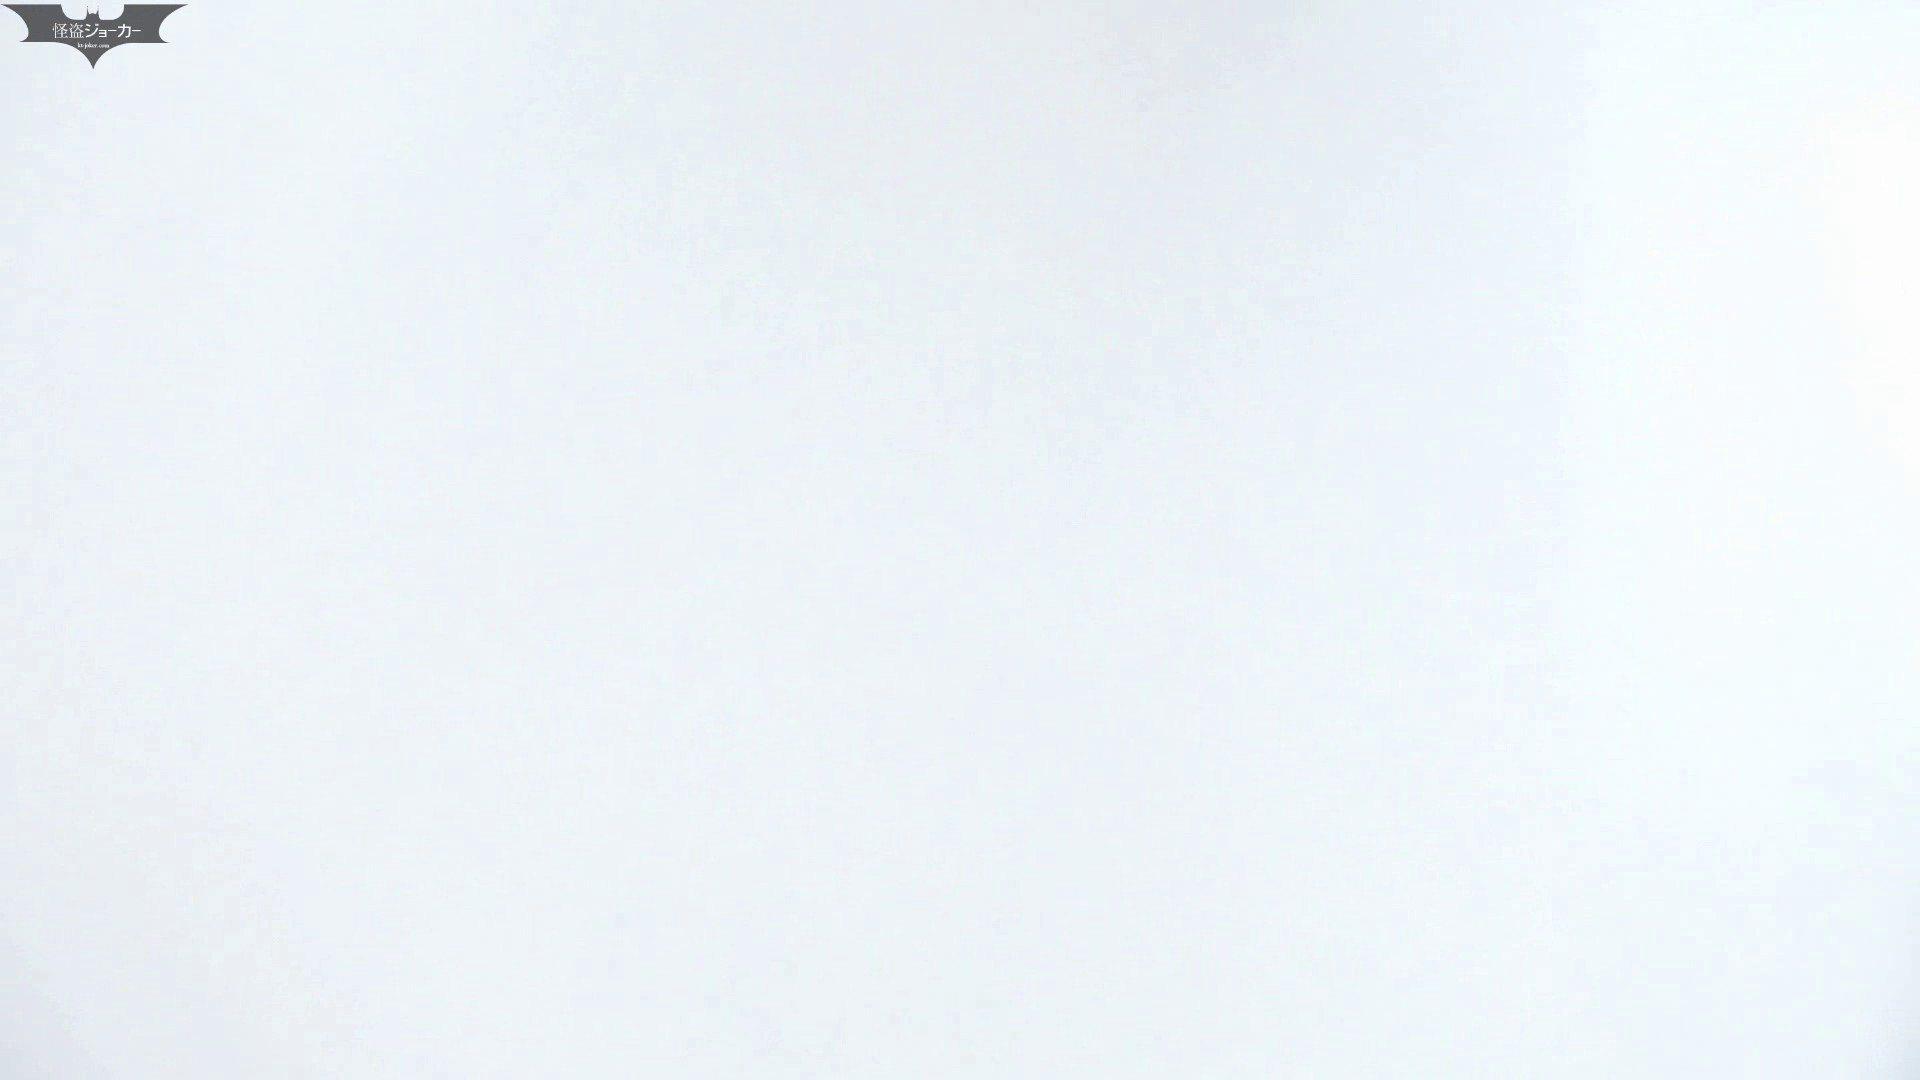 Vol.07 ワンピースの子を獲物を狩るようにくっ付いて追い撮り OL   潜入エロ調査  56連発 15